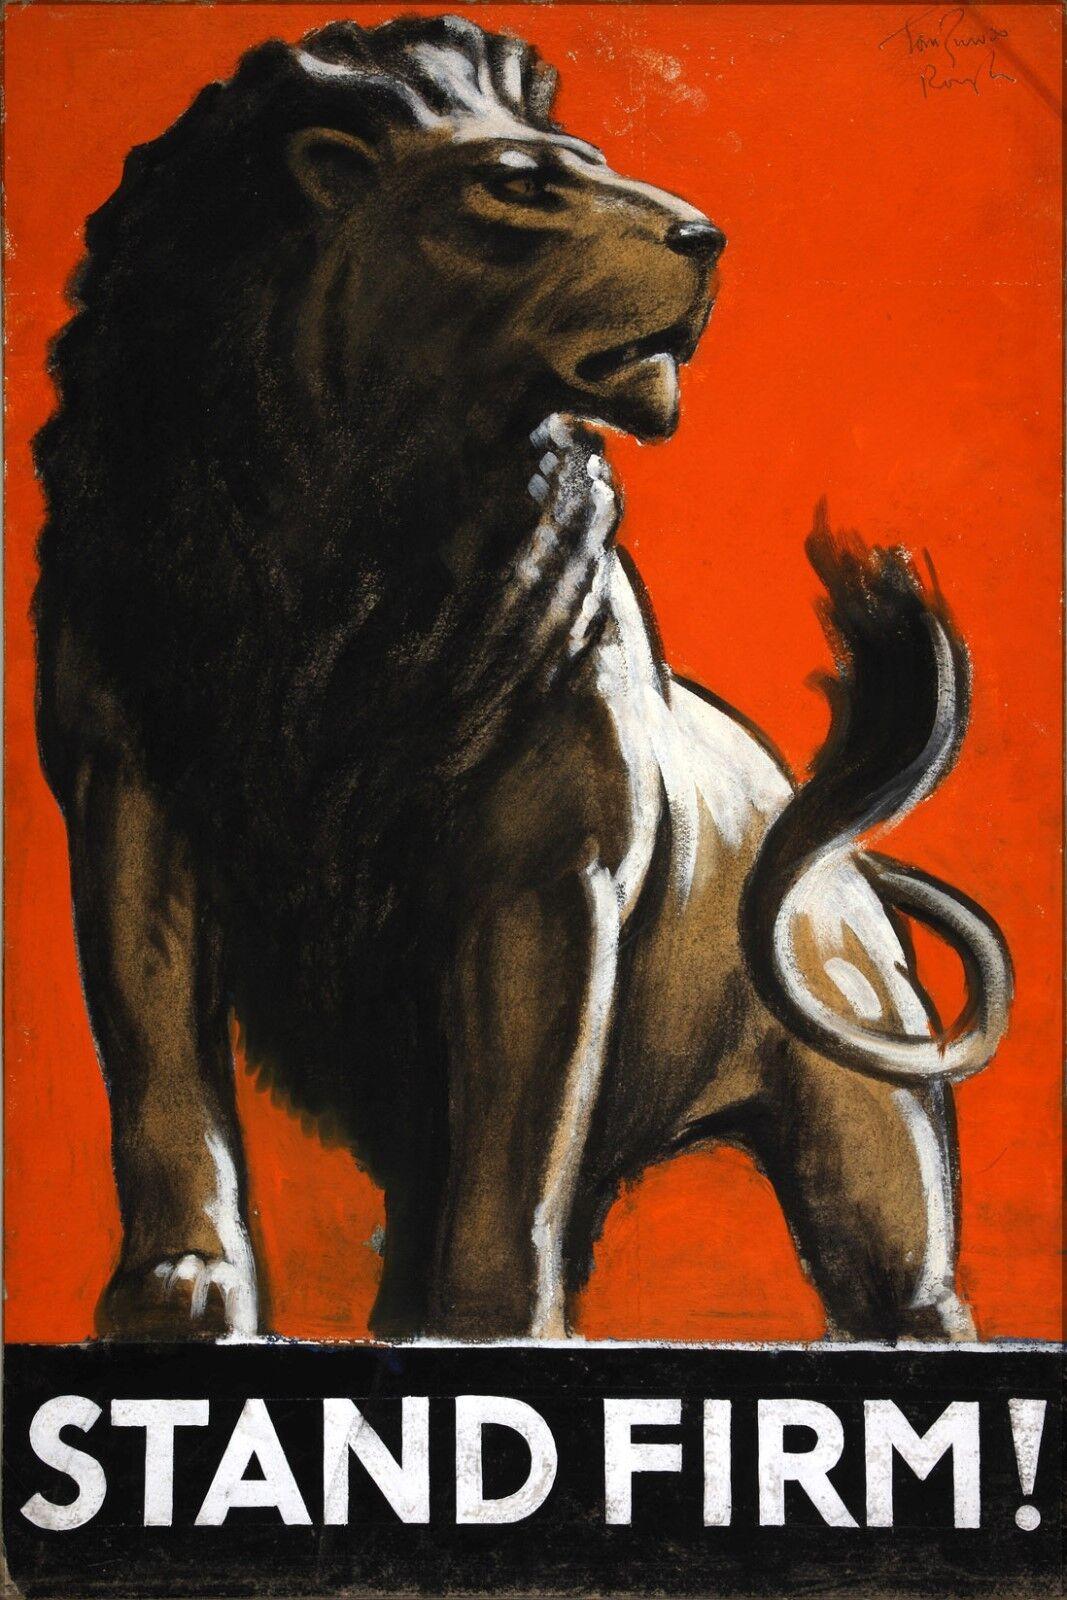 Affiche,Plusieurs Tailles; Effort Inf3 128 War Effort Tailles; Plate-Forme Ferme Lion Artiste aa8fc4